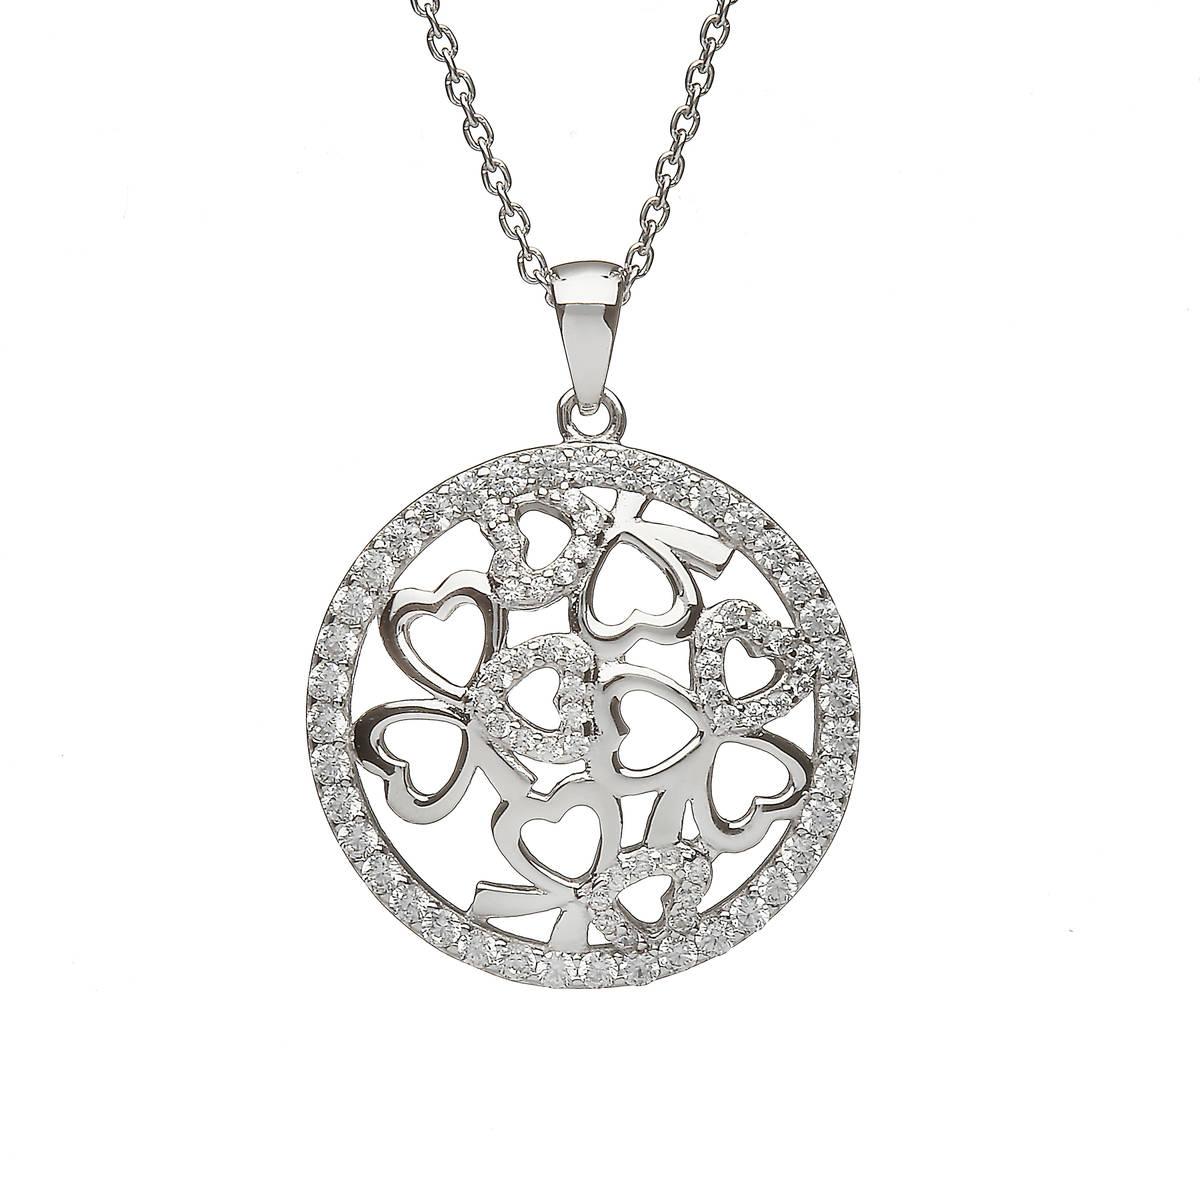 Sterling Silver Circular Shamrock Design Pendant Set With Cubic Zirconias